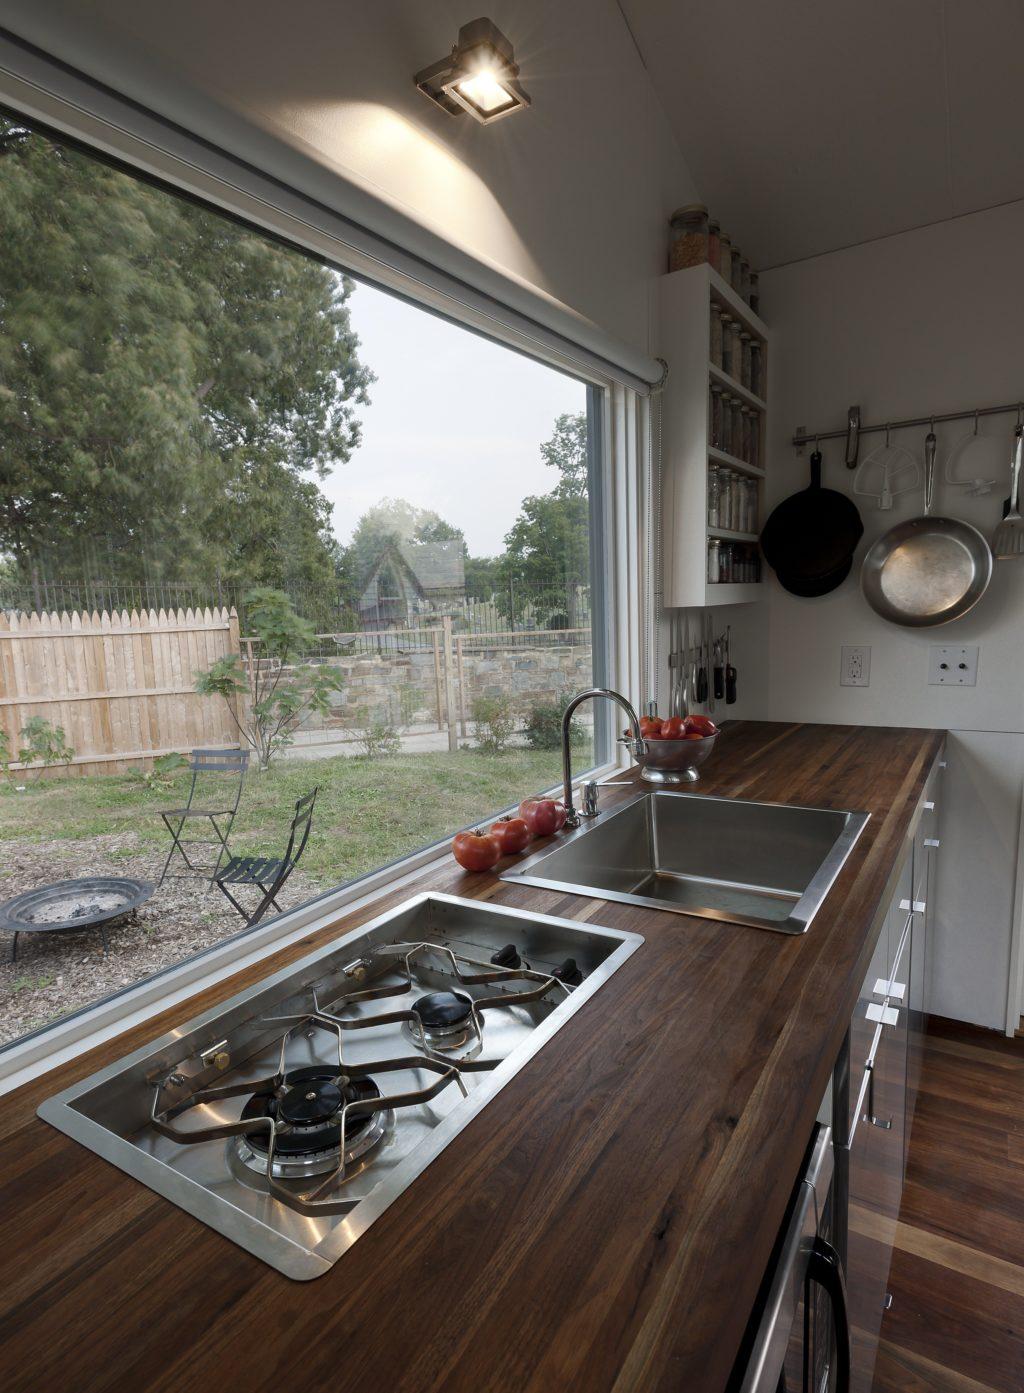 Minim Micro Homes Starting At 70 000 Tiny Living